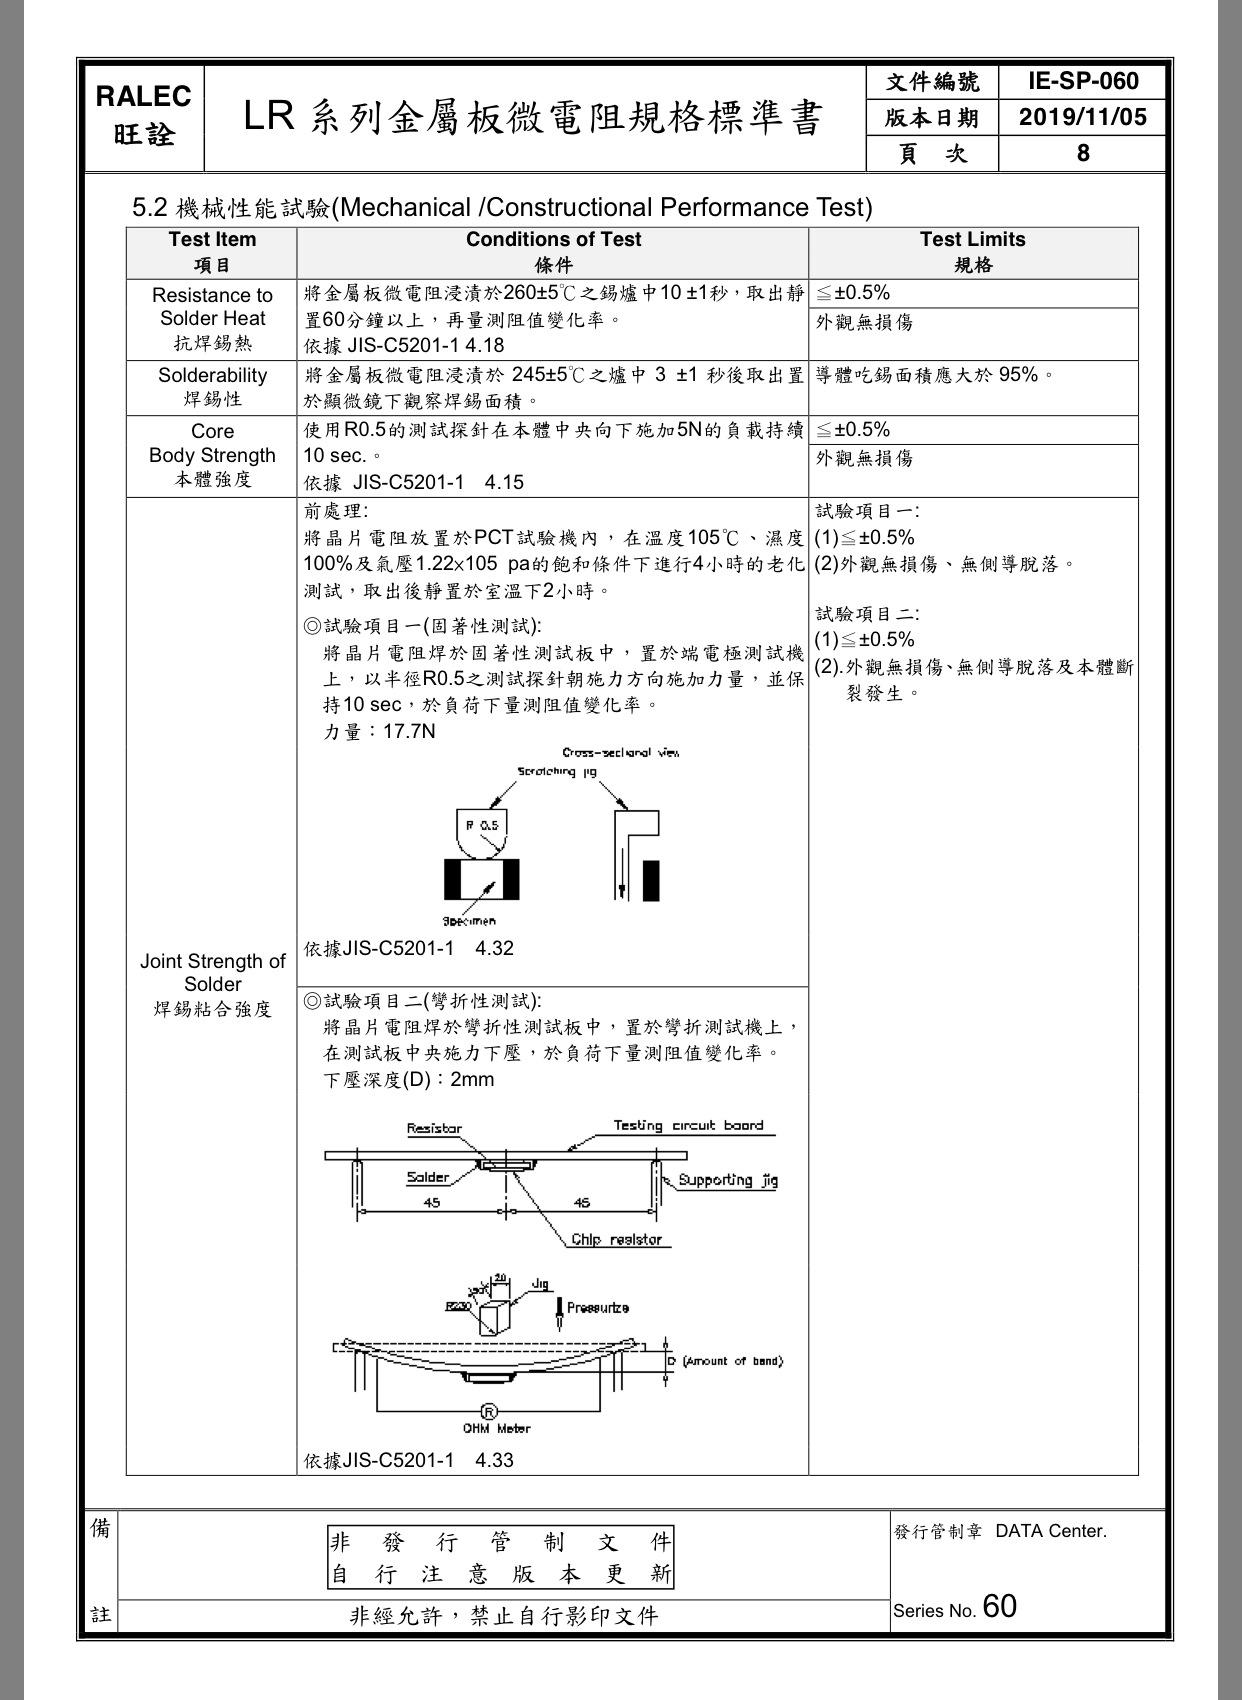 IMG_8478(20200605-111136)